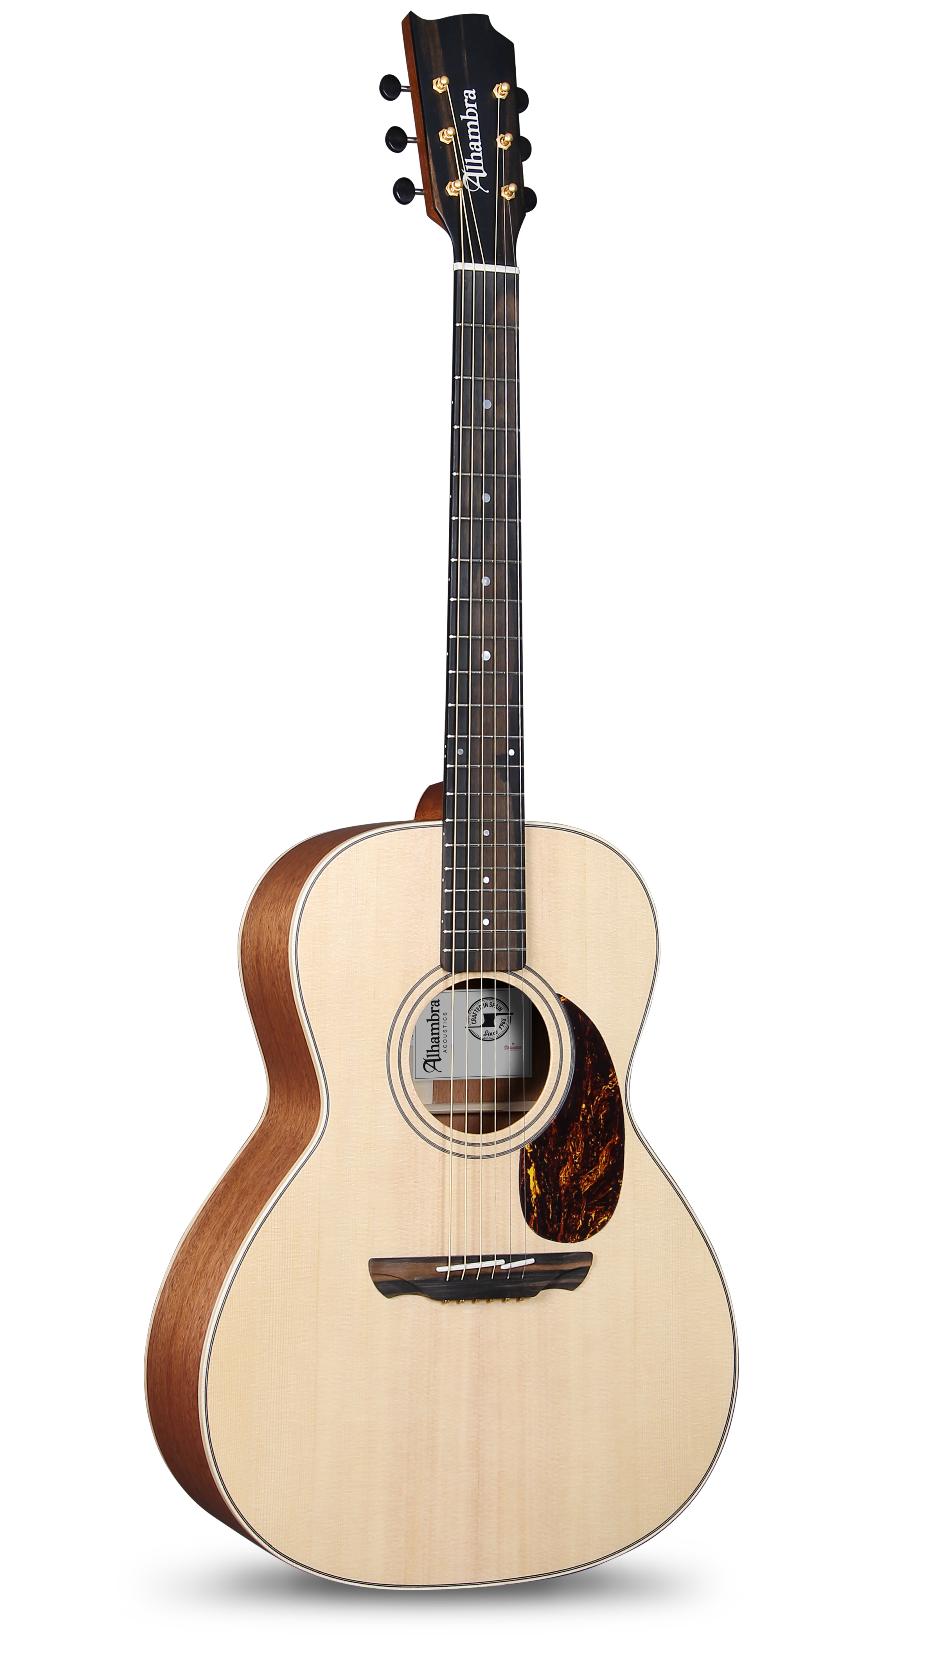 New models of Alhambra Acoustic Guitars